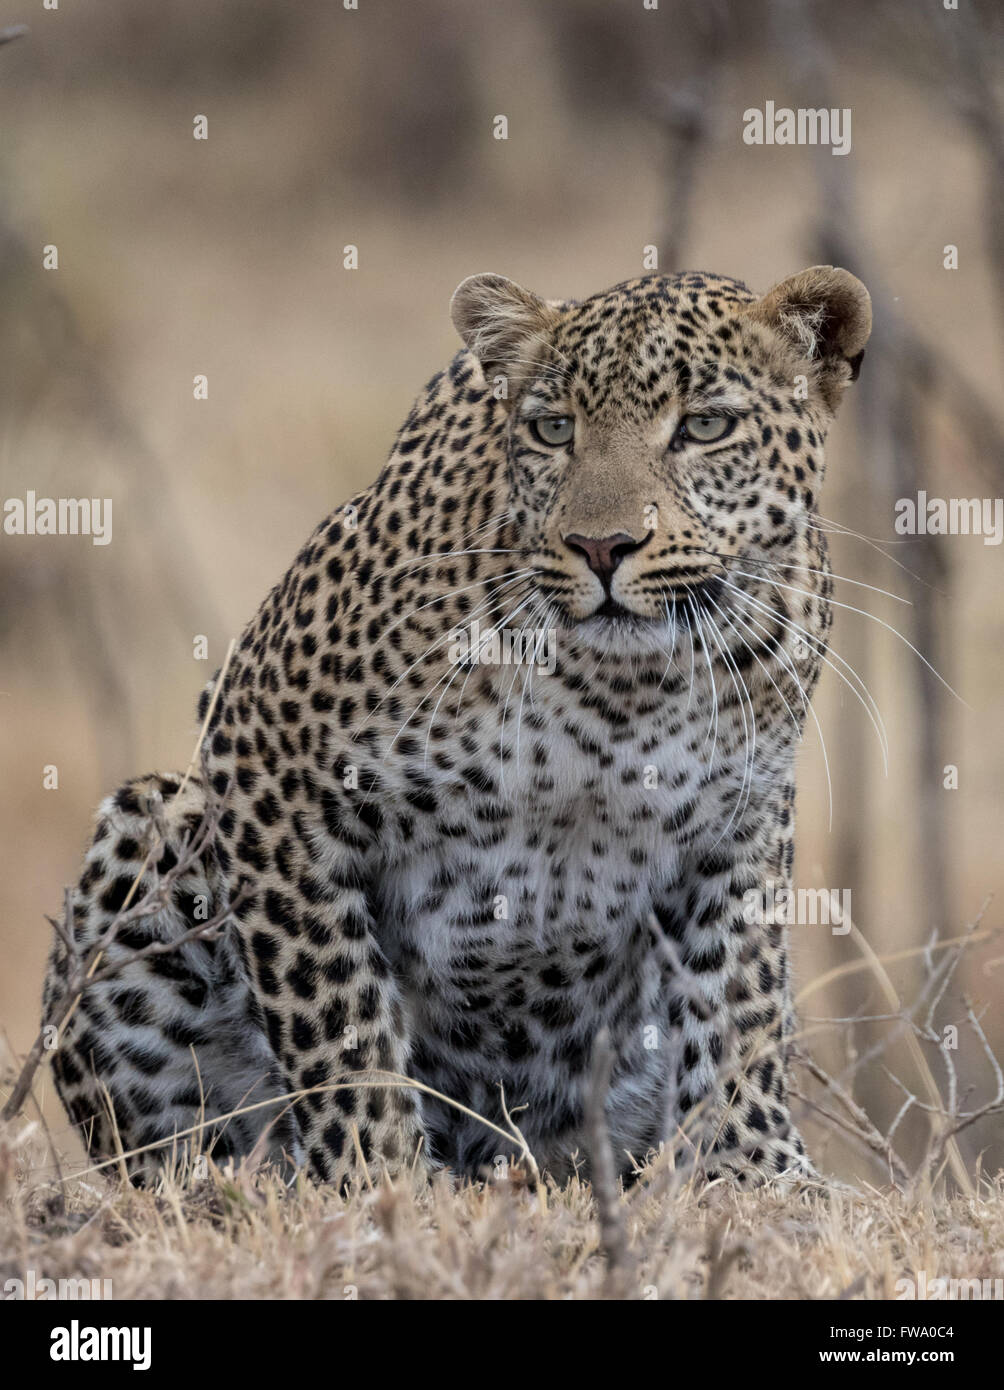 Leopard (Panthera Pardus) crouched ready to pounce taken in Masai Mara Kenya. Stock Photo